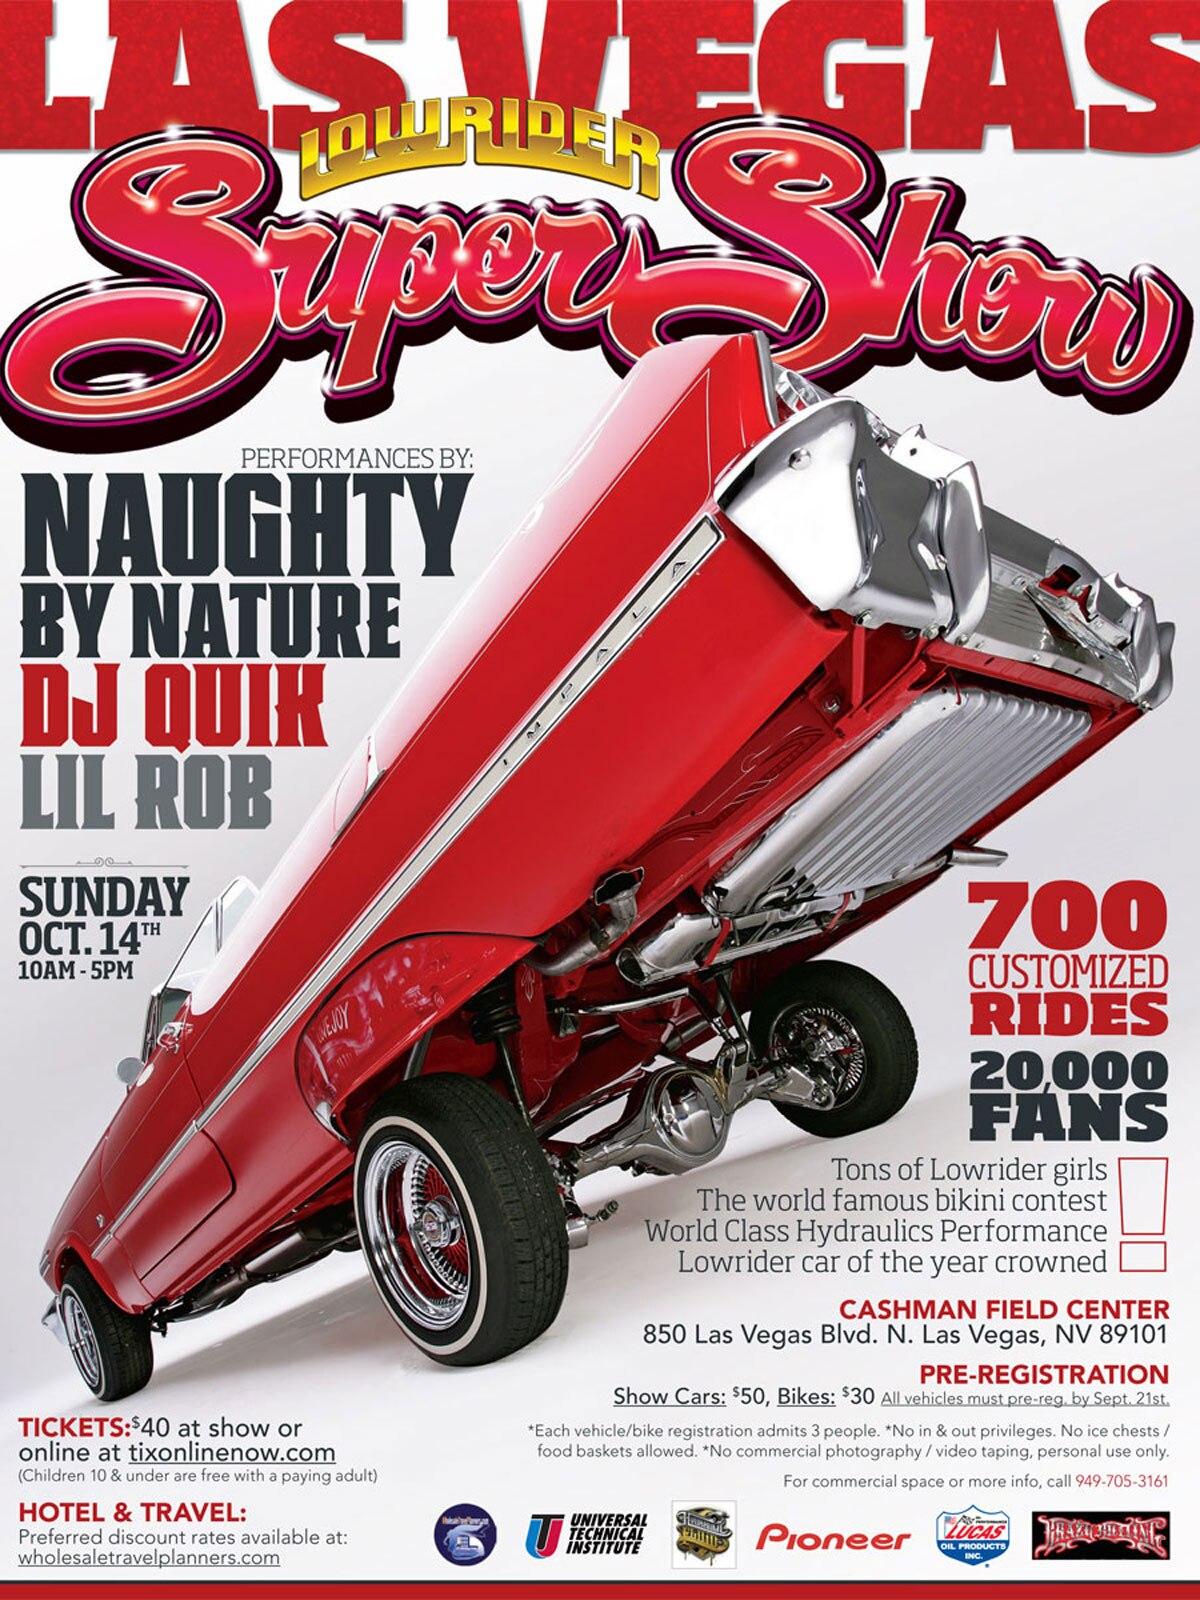 1209-lrmp-01-o-lowrider-las-vegas-super-show-2012-flyer1